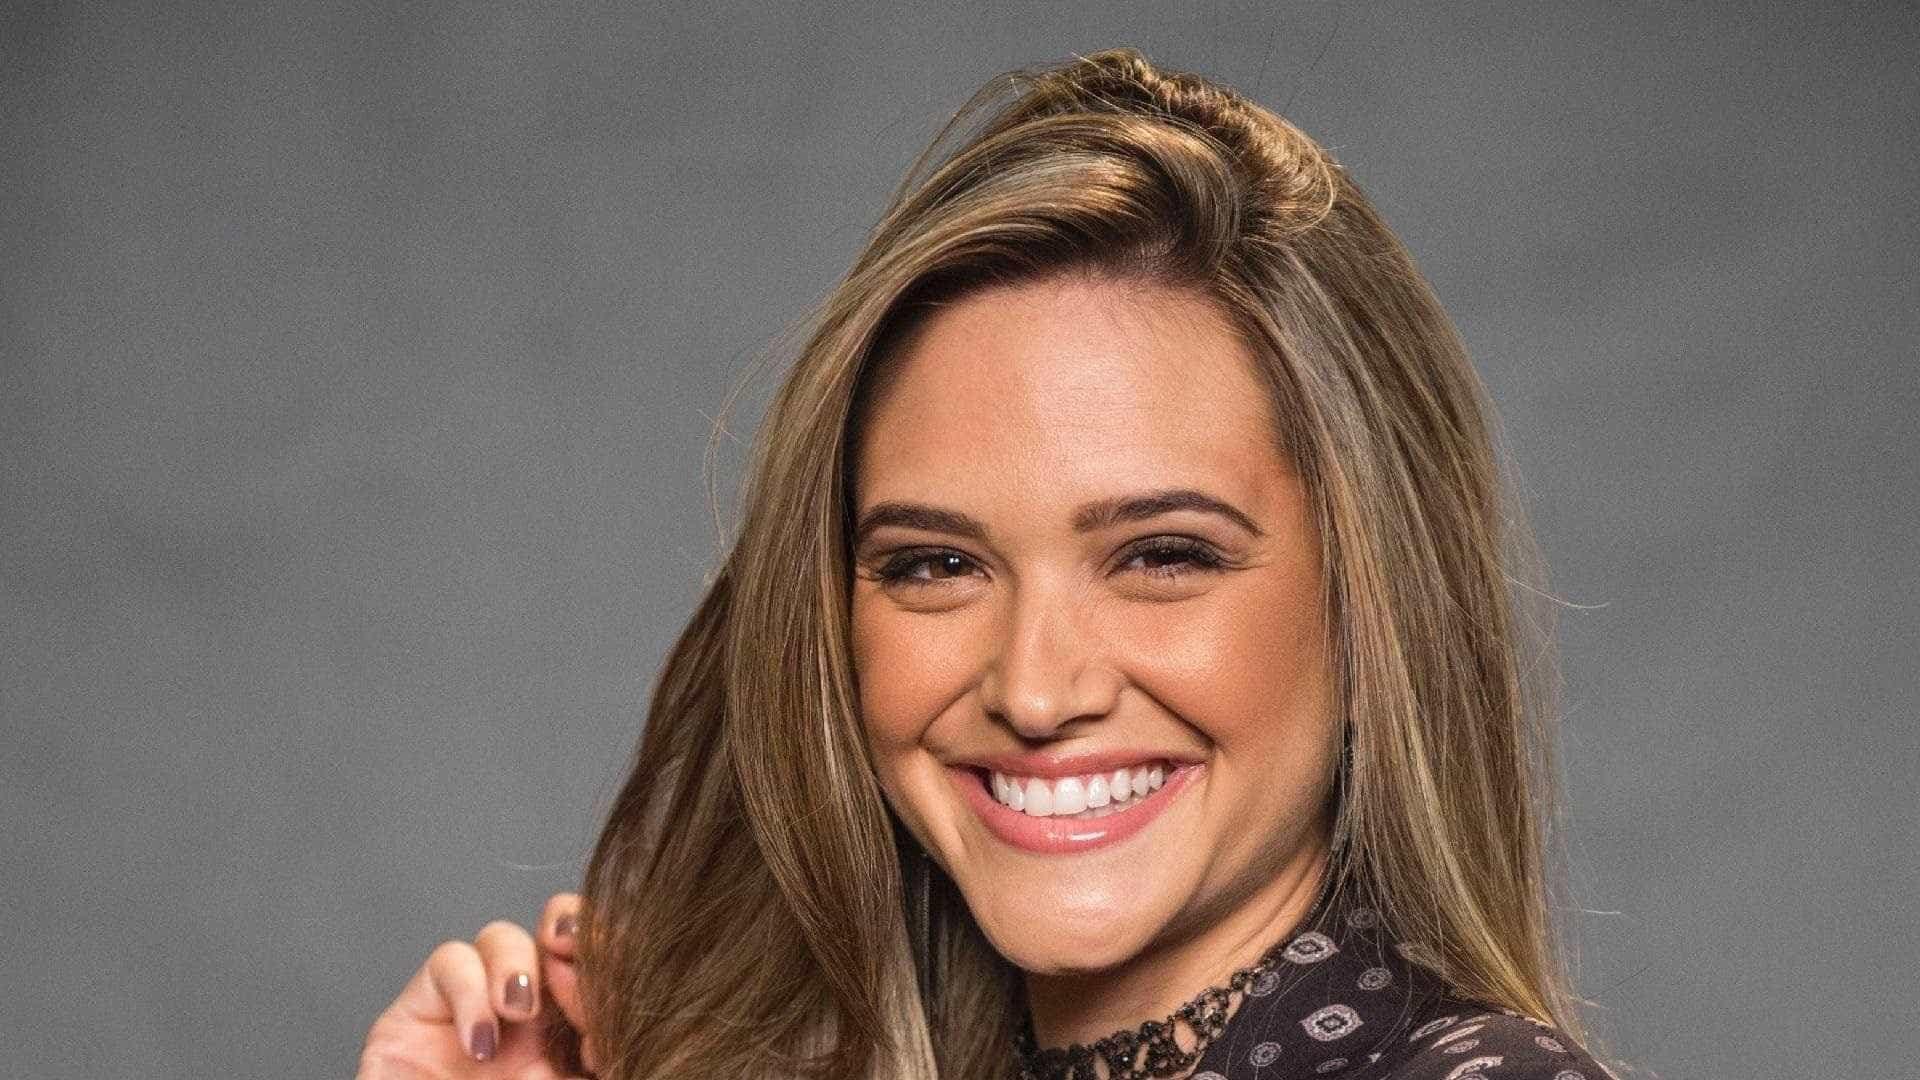 Juliana Paiva substitui Marquezine e Marina Ruy Barbosa em novela